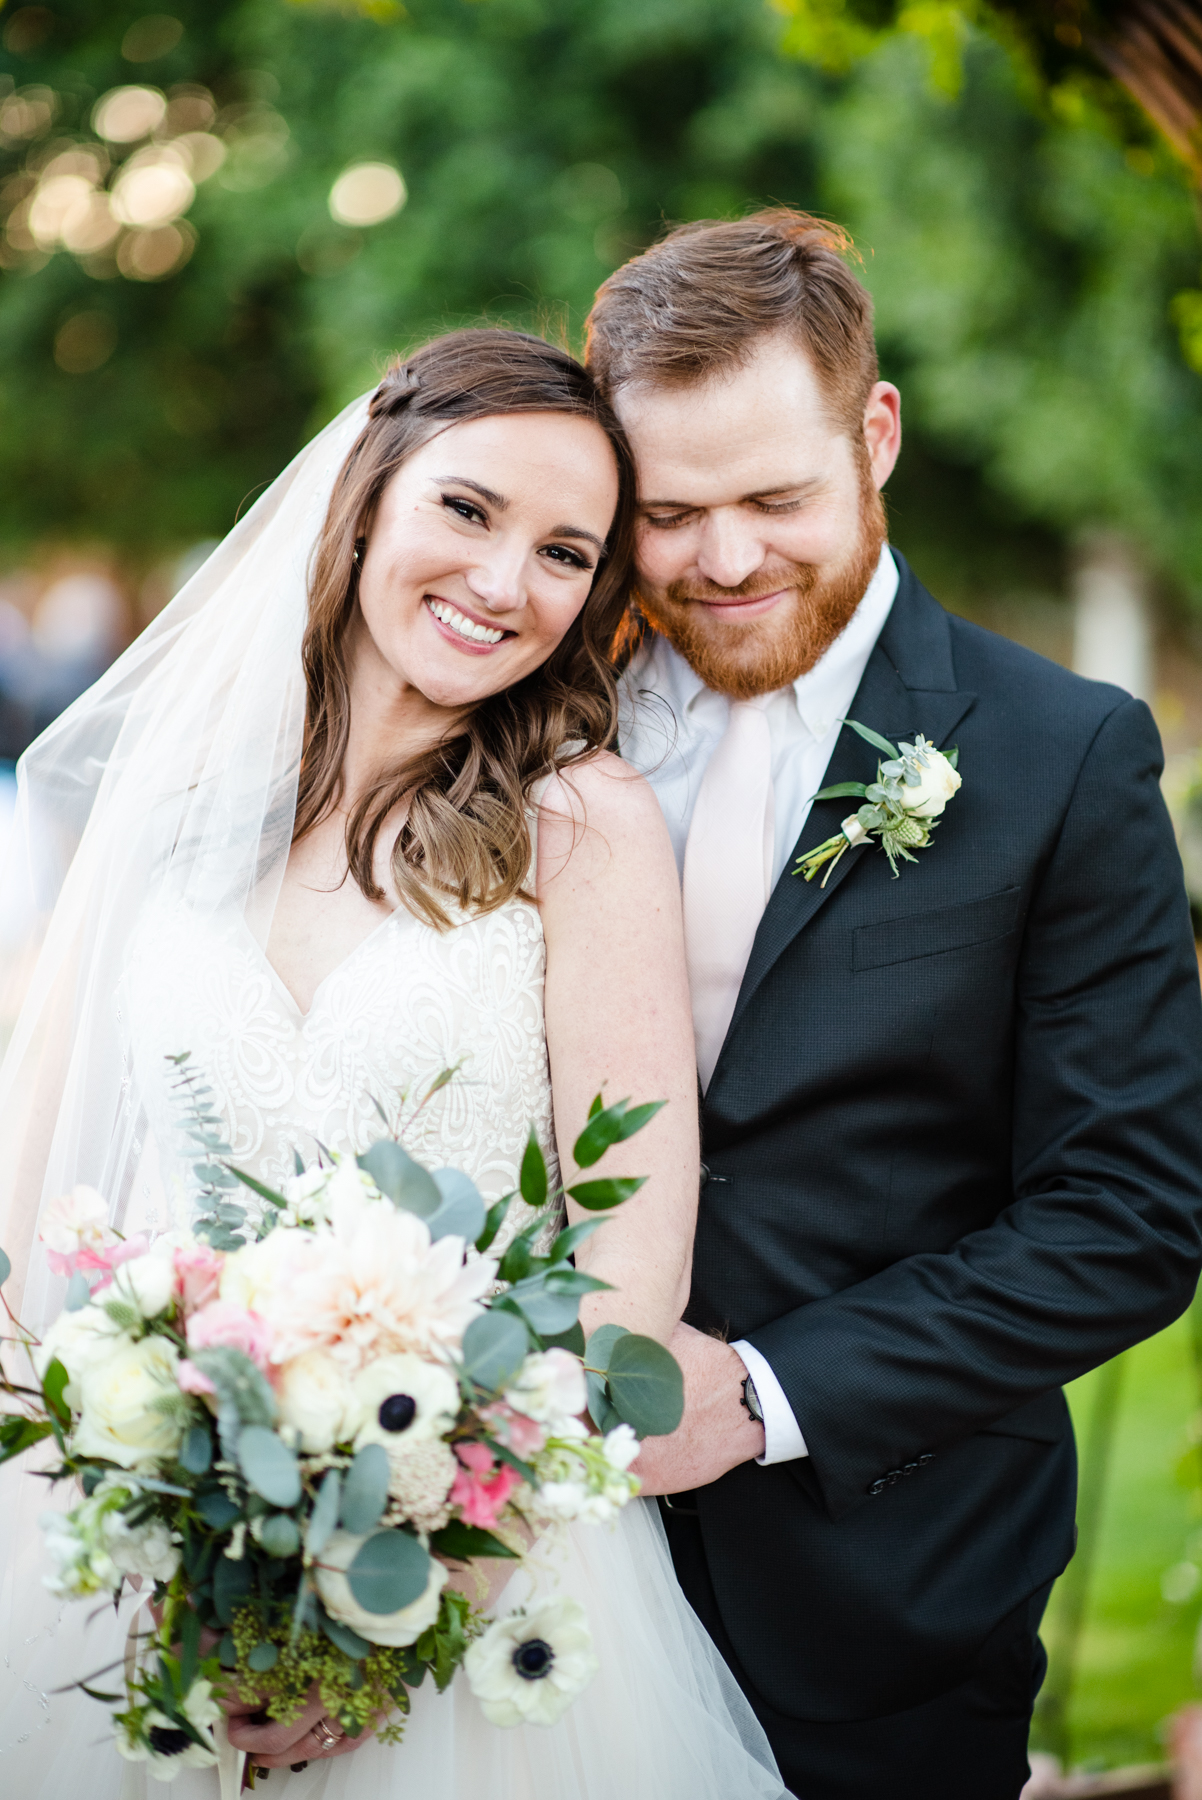 Bella Rose Estate Wedding - Meredith Amadee Photography-114.jpg